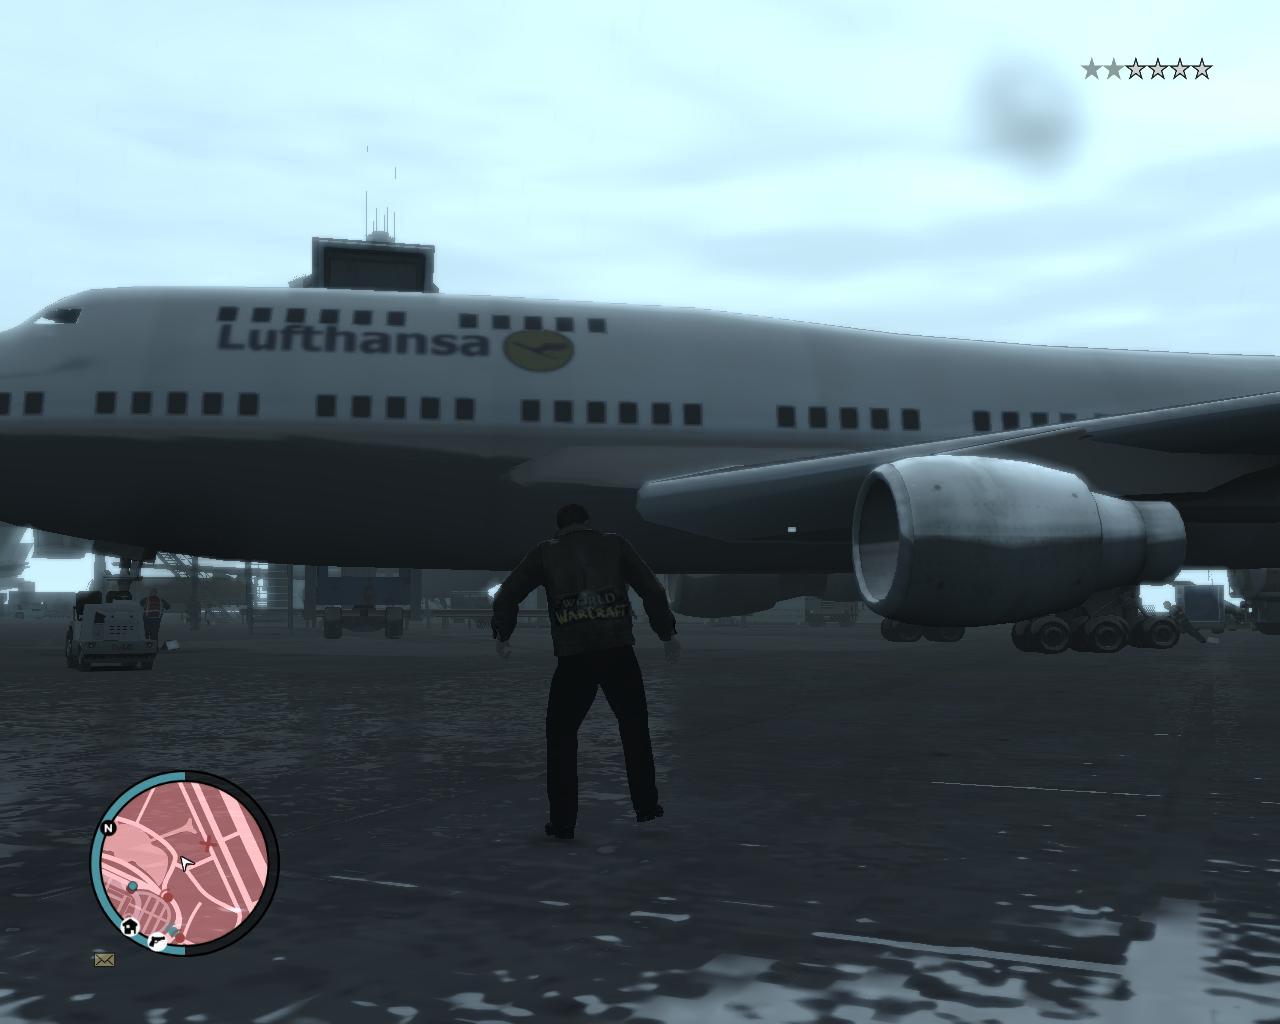 Aerei Lufthansa 187 Gta 4 187 Mods Generiche 187 Gta Expert It